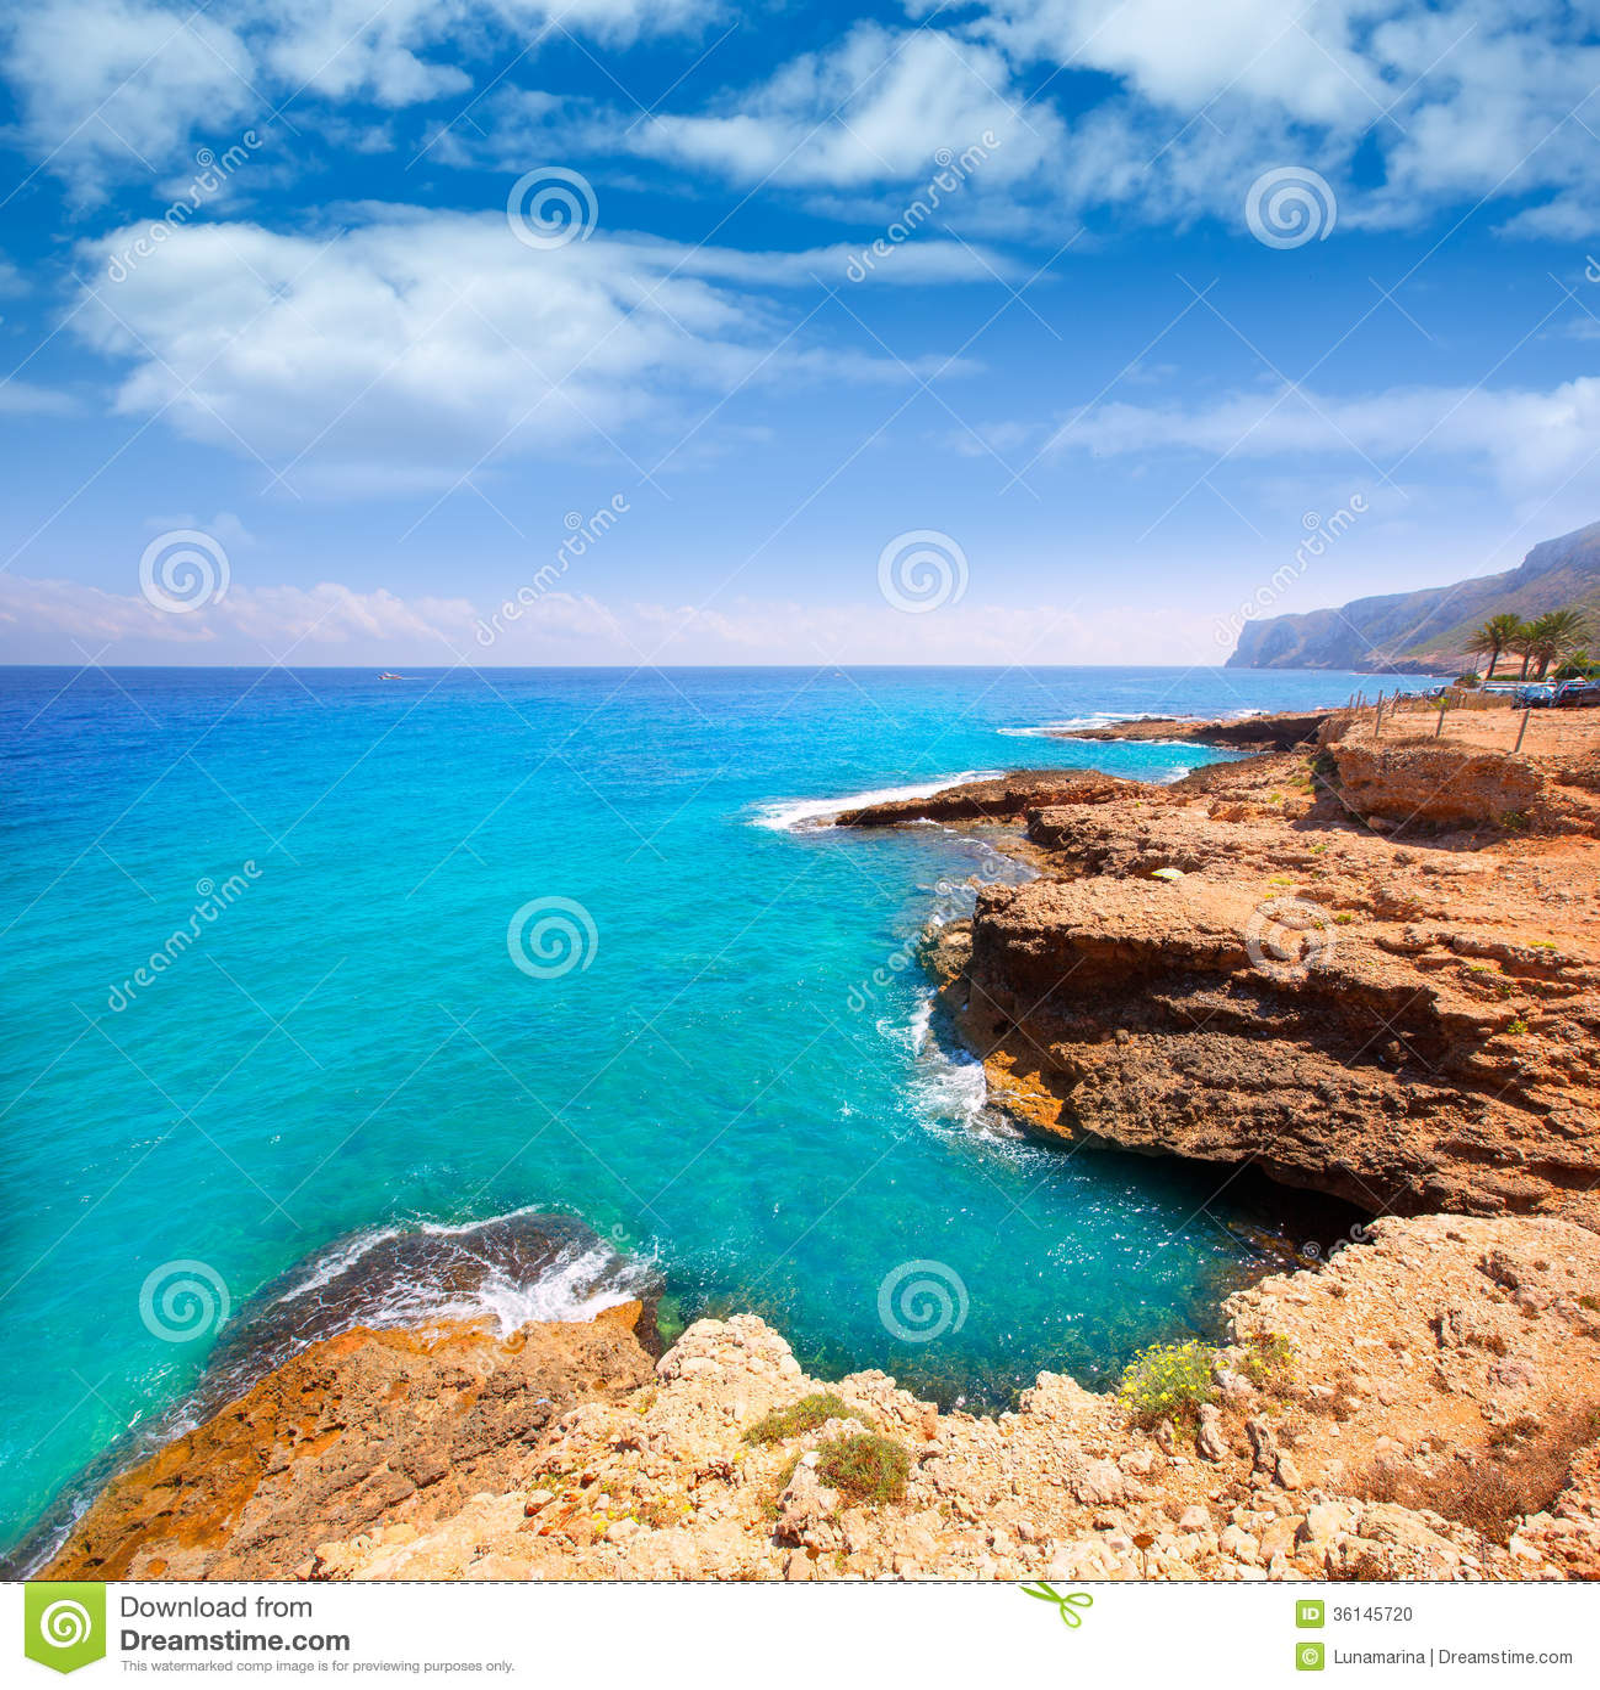 denia alicante las rotas rocky beach in spain stock photo image of